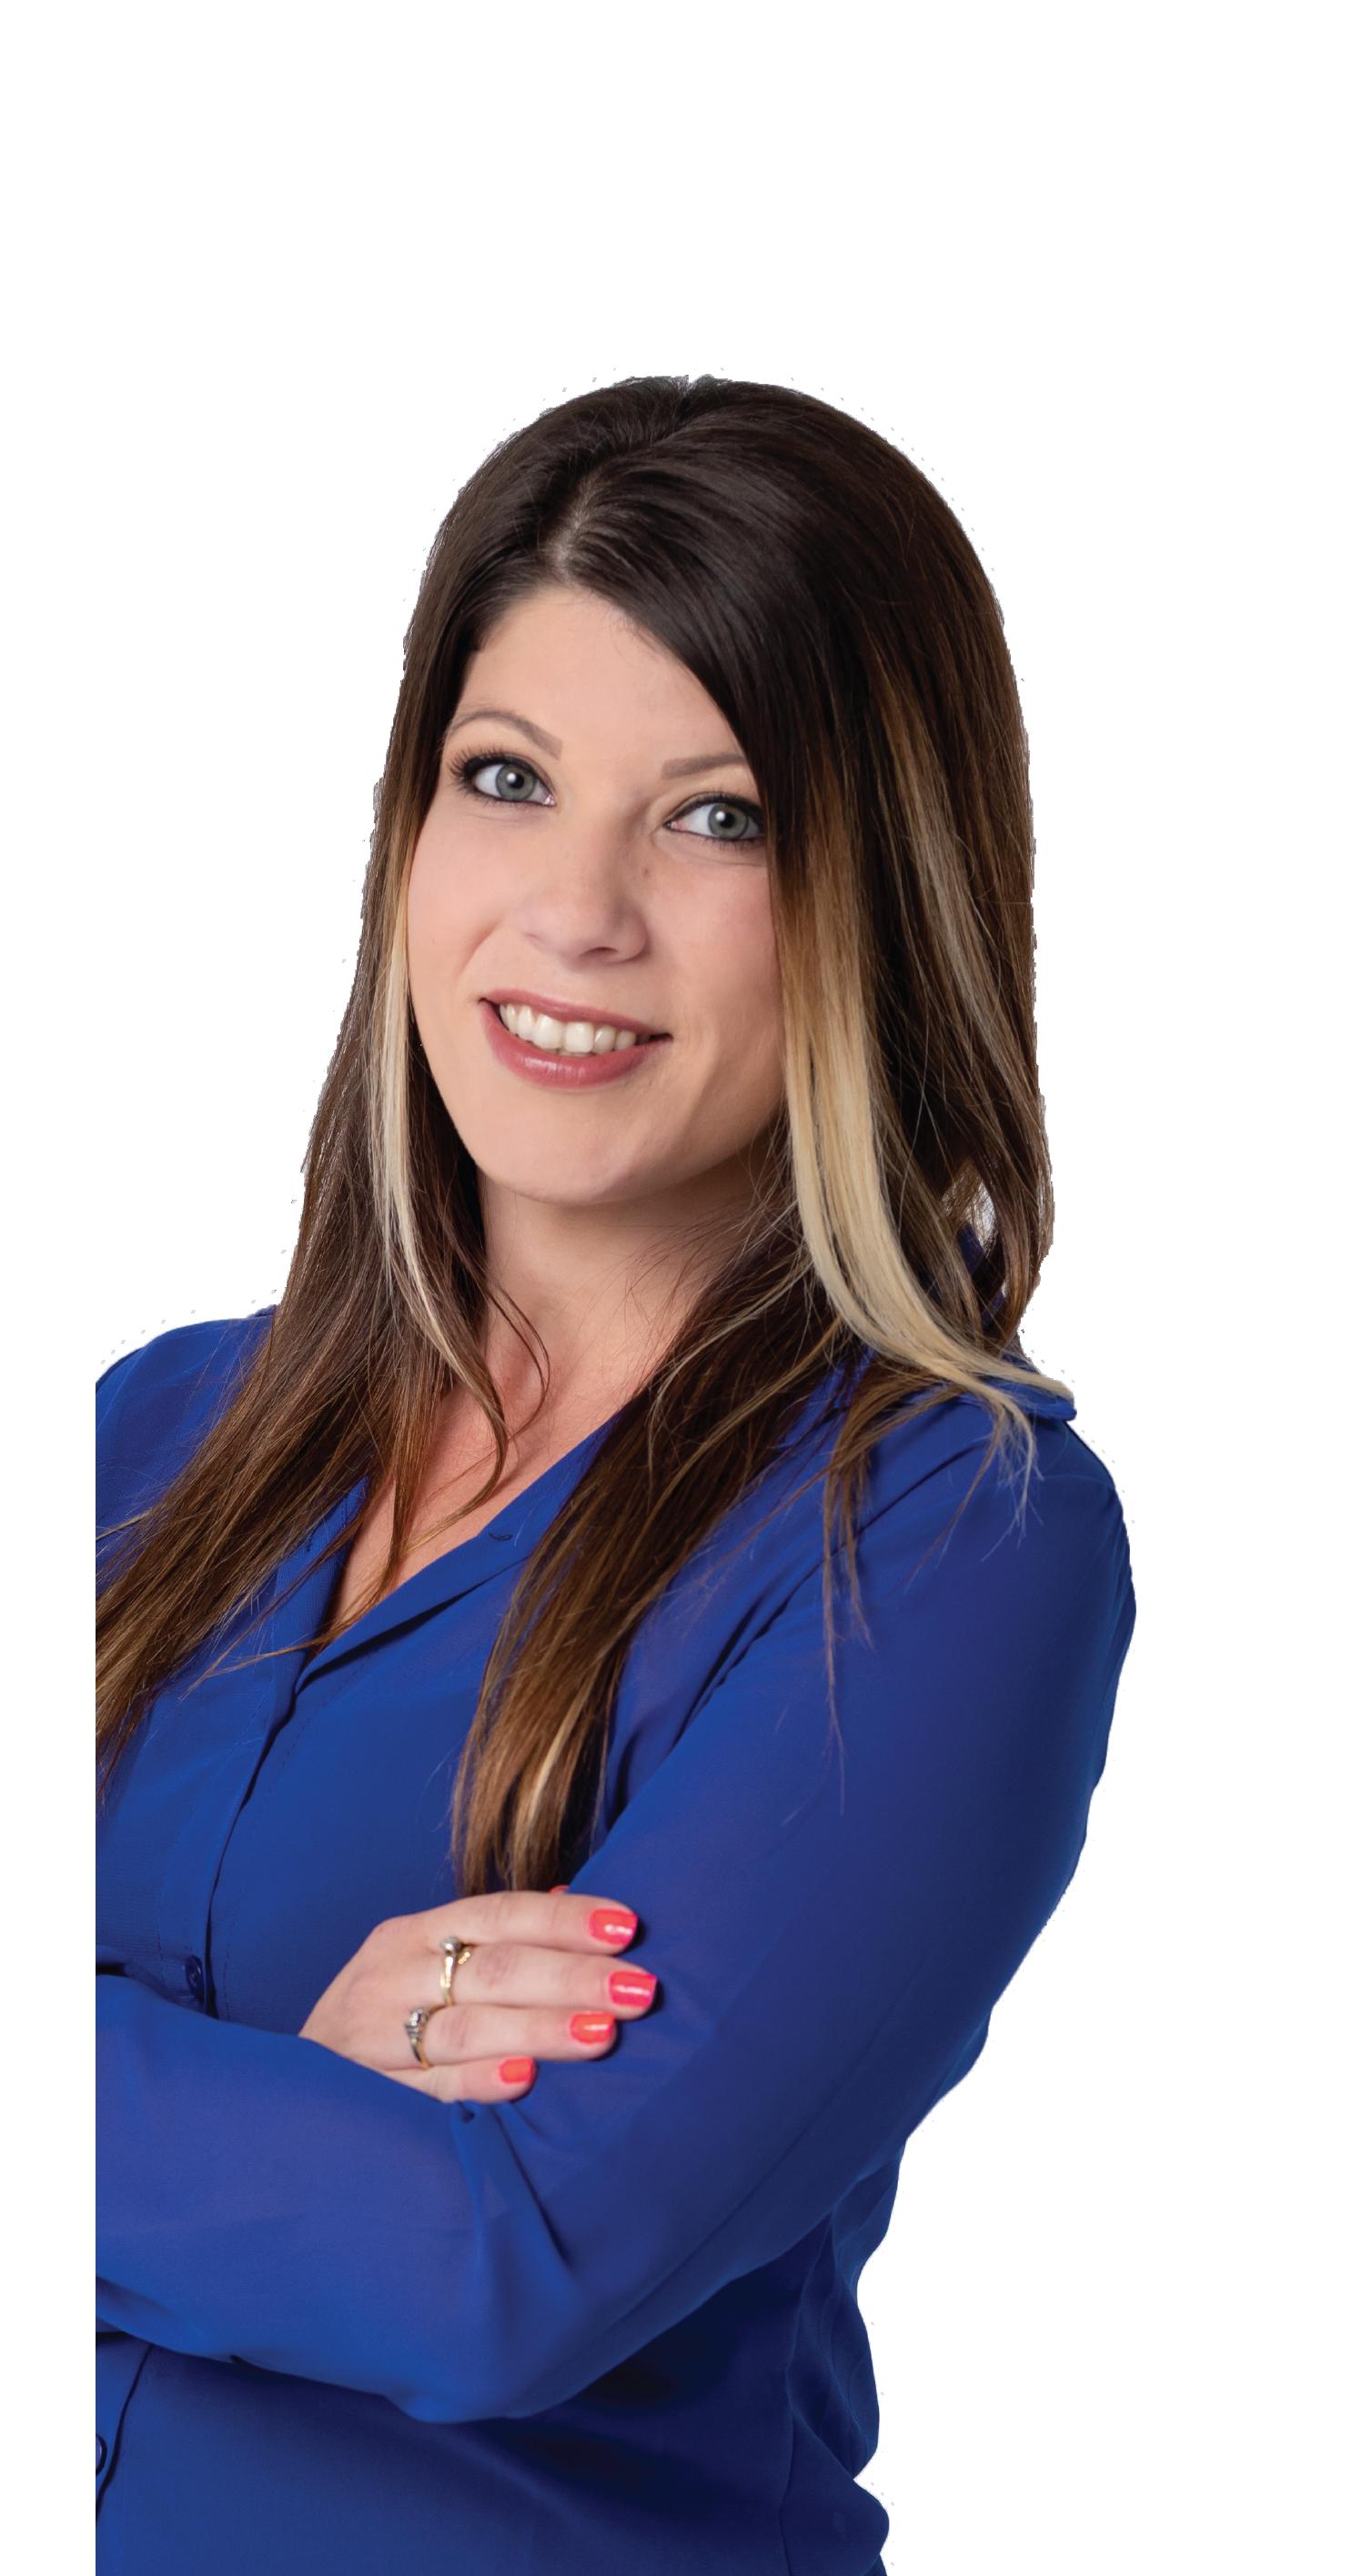 Katie Maley - Member Service Representativekatie@dilloncu.com